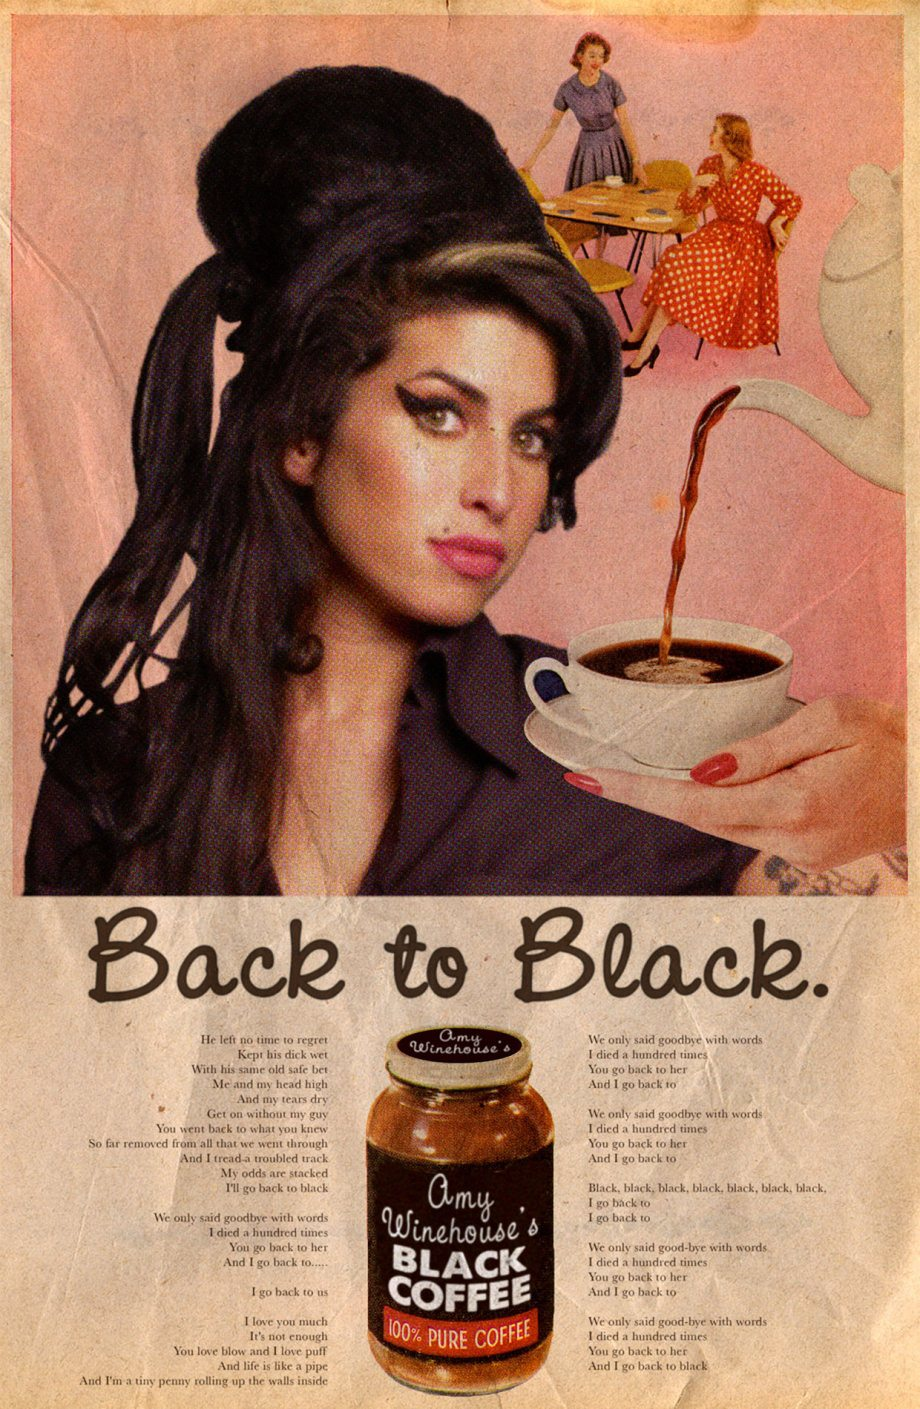 david-redon-vintage-ads-pop-culture-icons-07